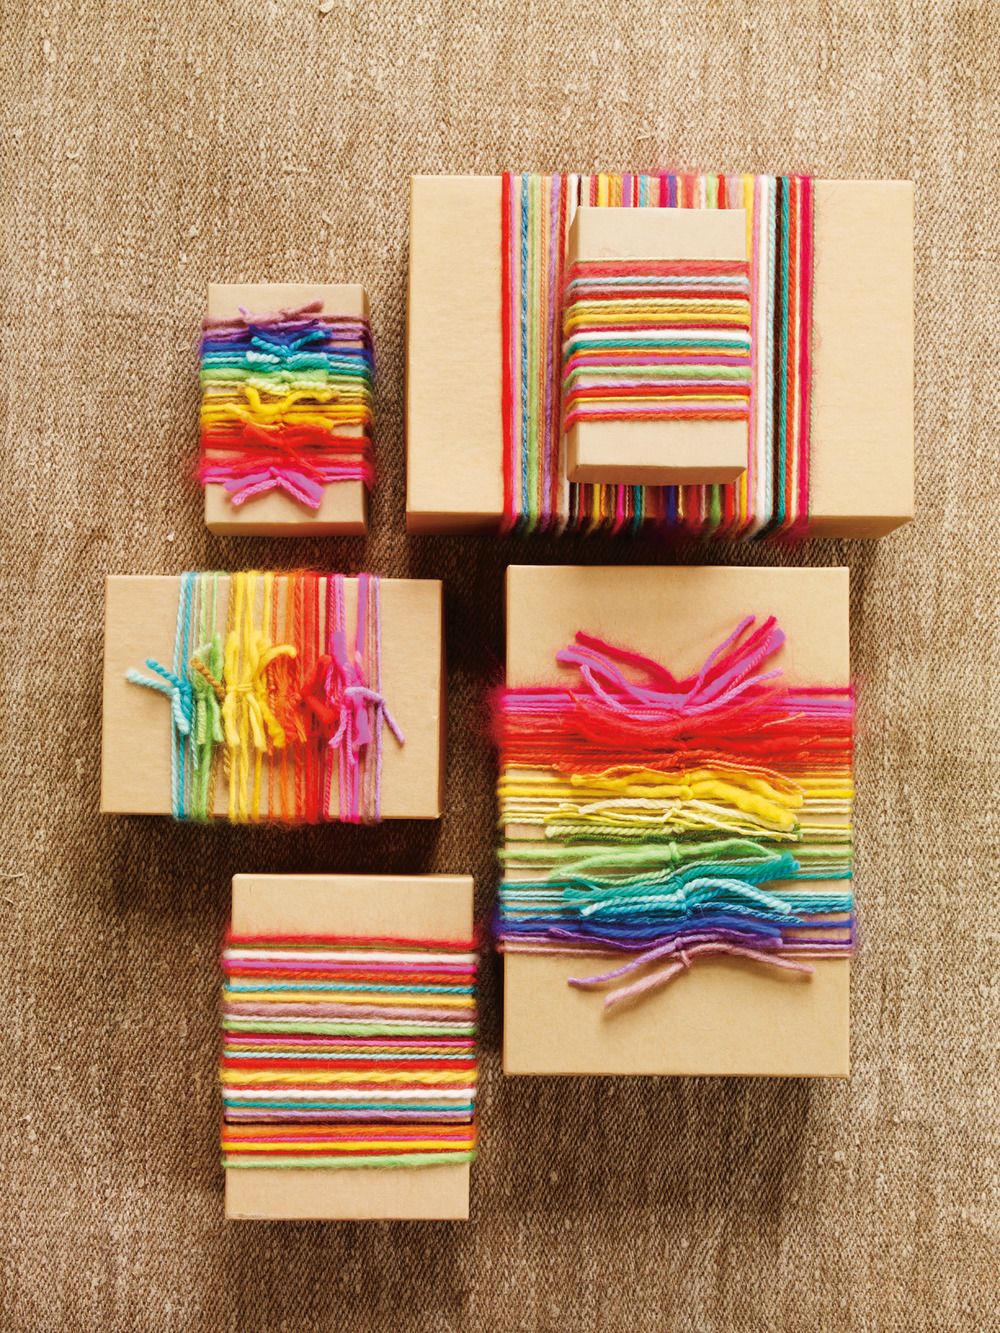 Using Yarn For Decoration